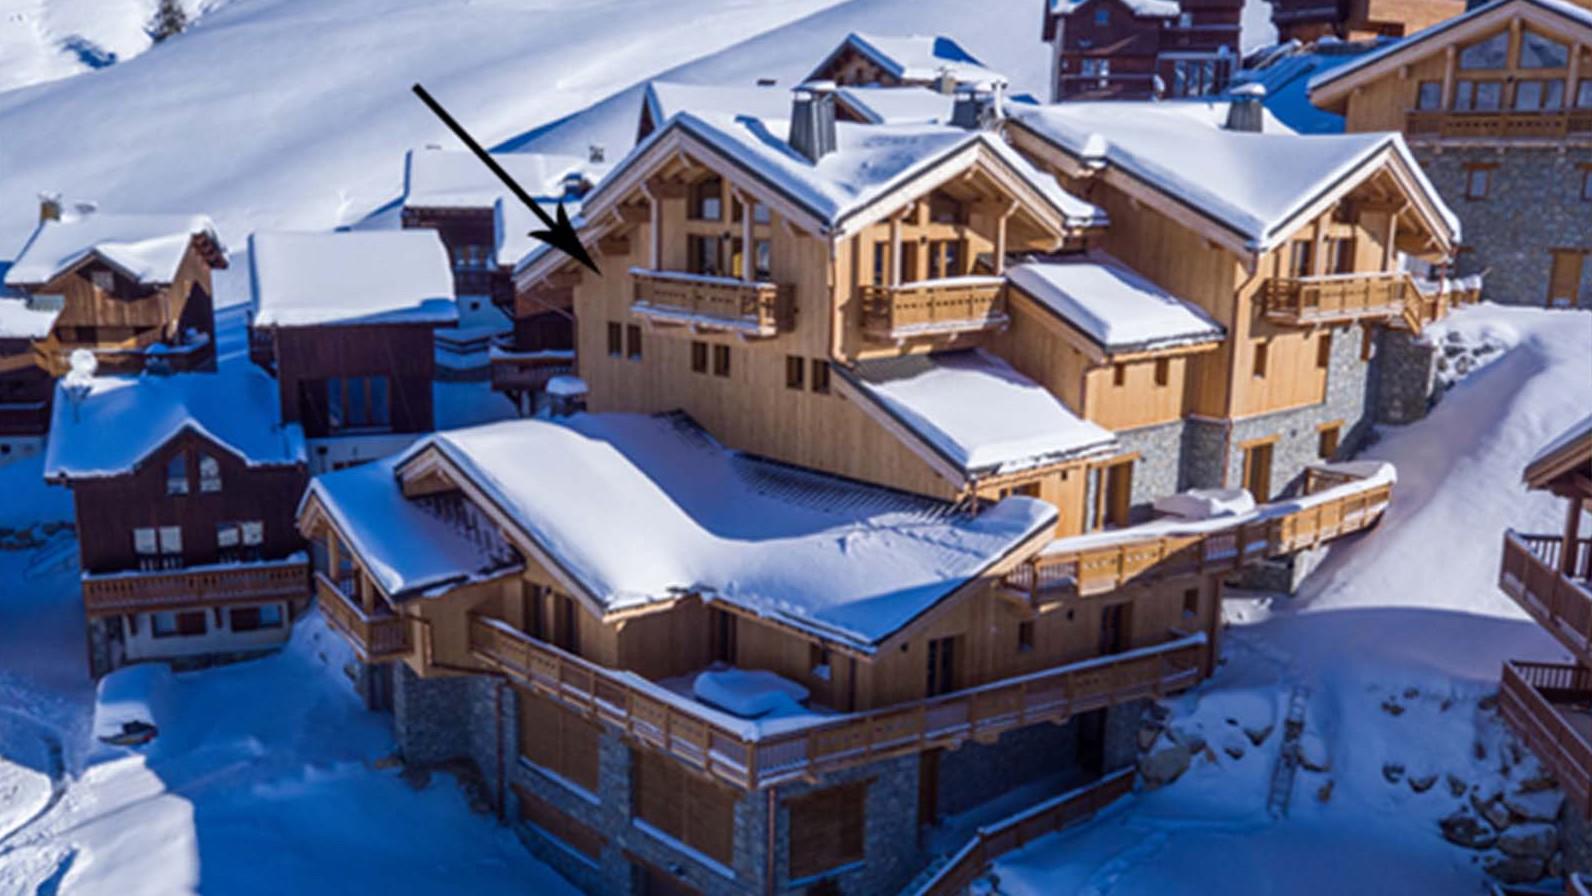 Arial Exterior - Chalet Hepatica - Ski Chalet in La Plagne, France